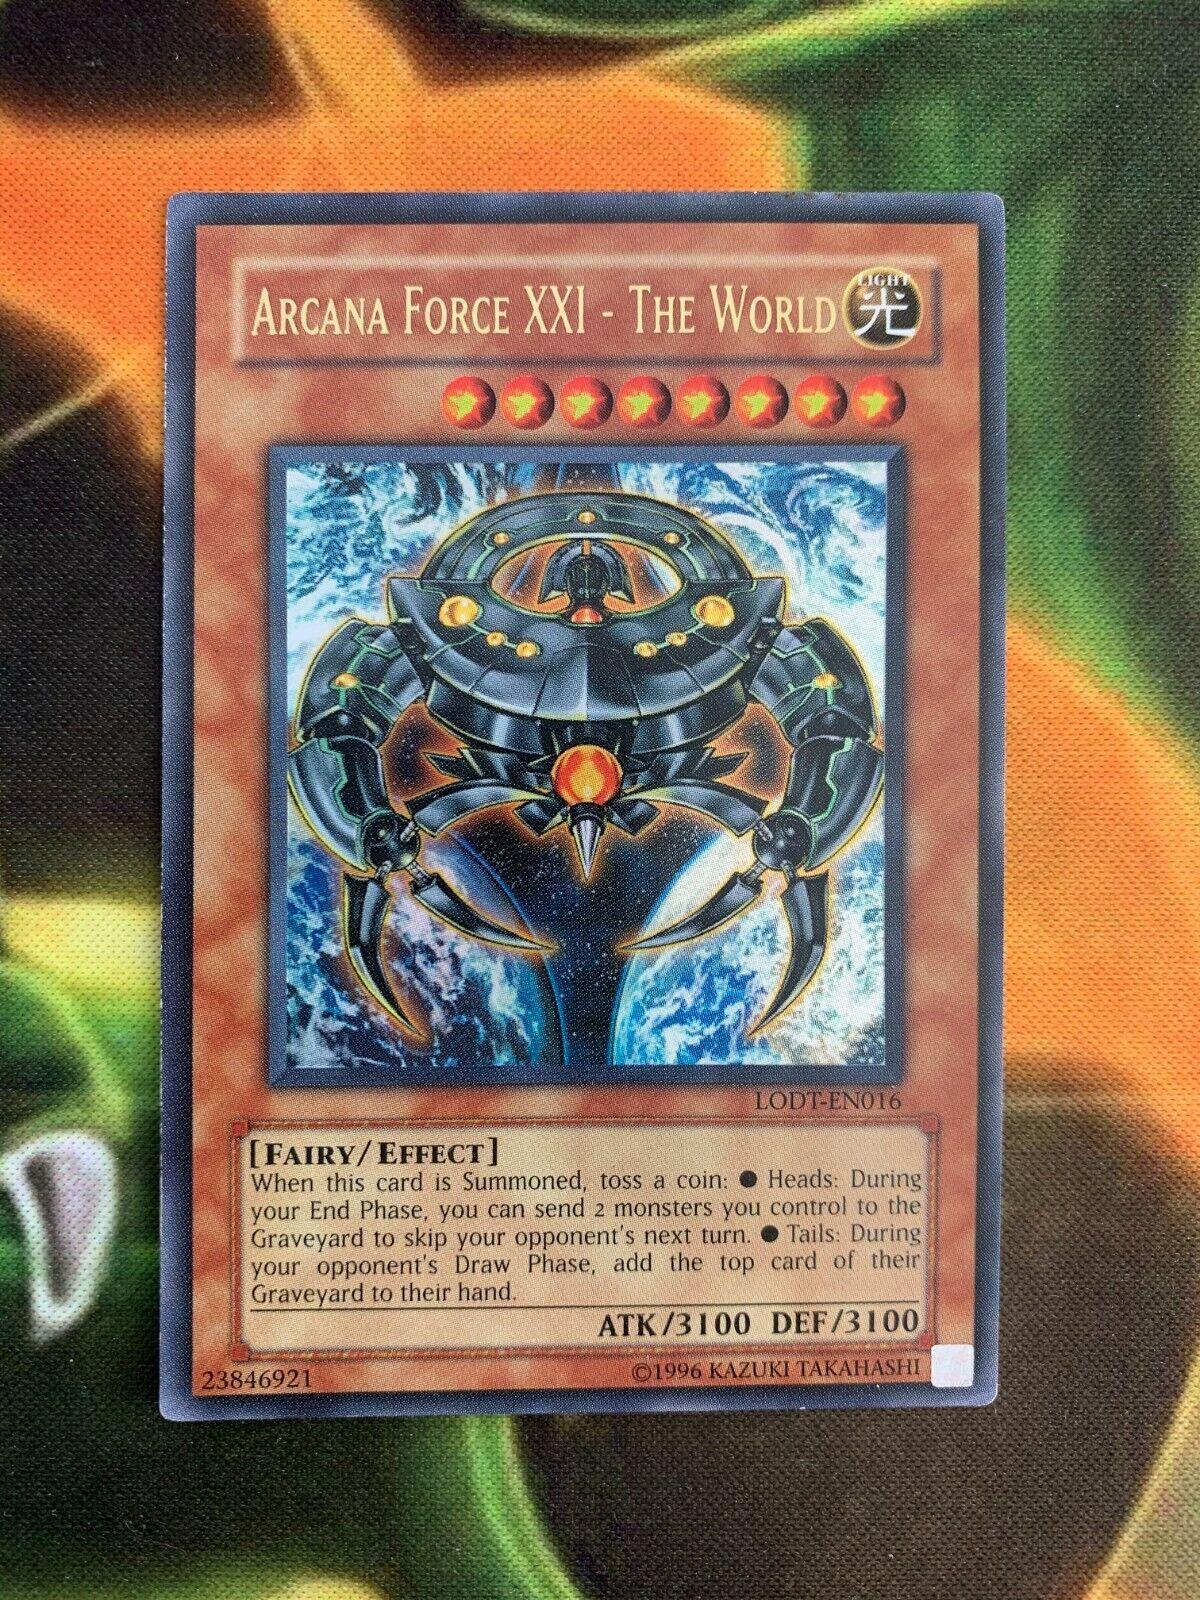 Yugioh Arcana Force XXI - The World LODT-EN016 Ultra Rare VLP  - $10.95